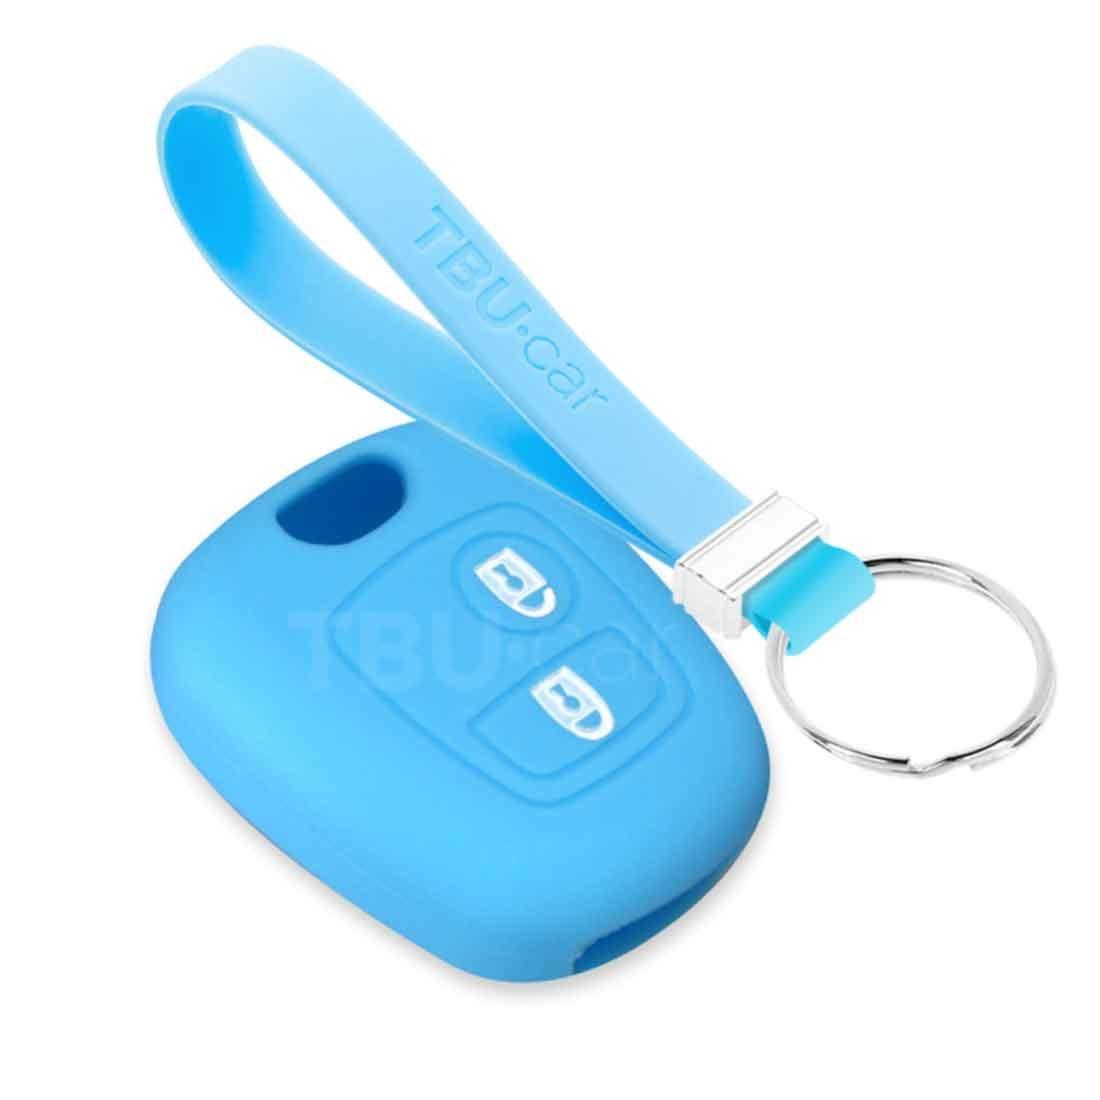 TBU car TBU car Car key cover compatible with Citroën - Silicone Protective Remote Key Shell - FOB Case Cover - Light Blue